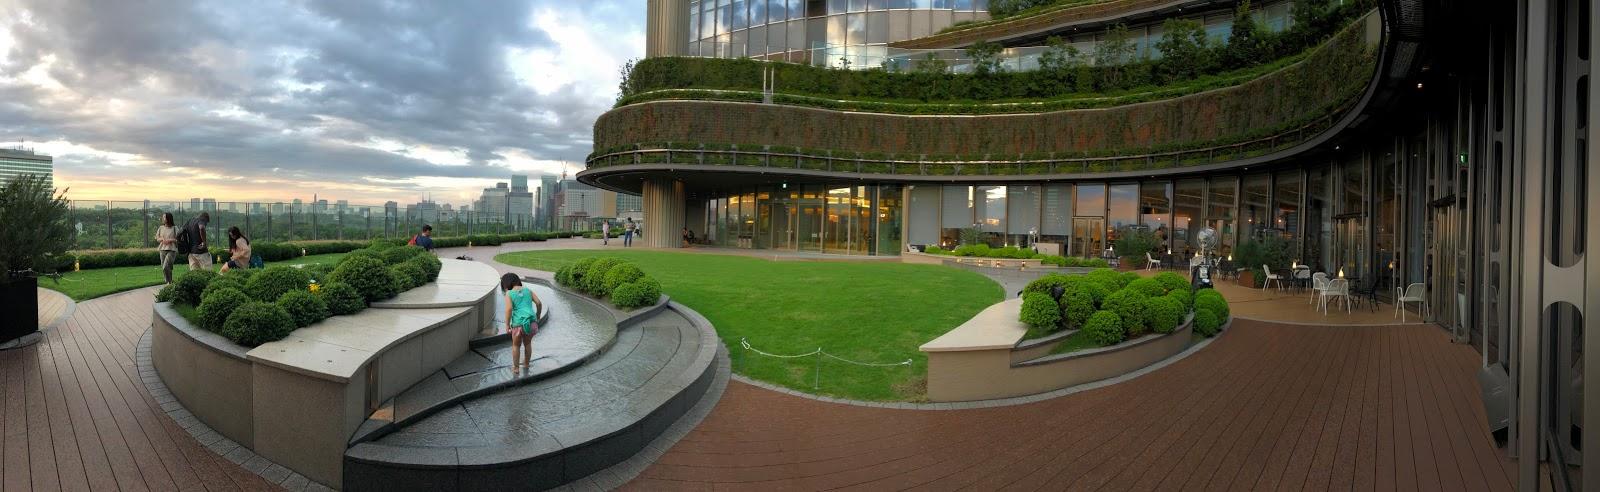 Tokyo Hibiya Midtown park view garden